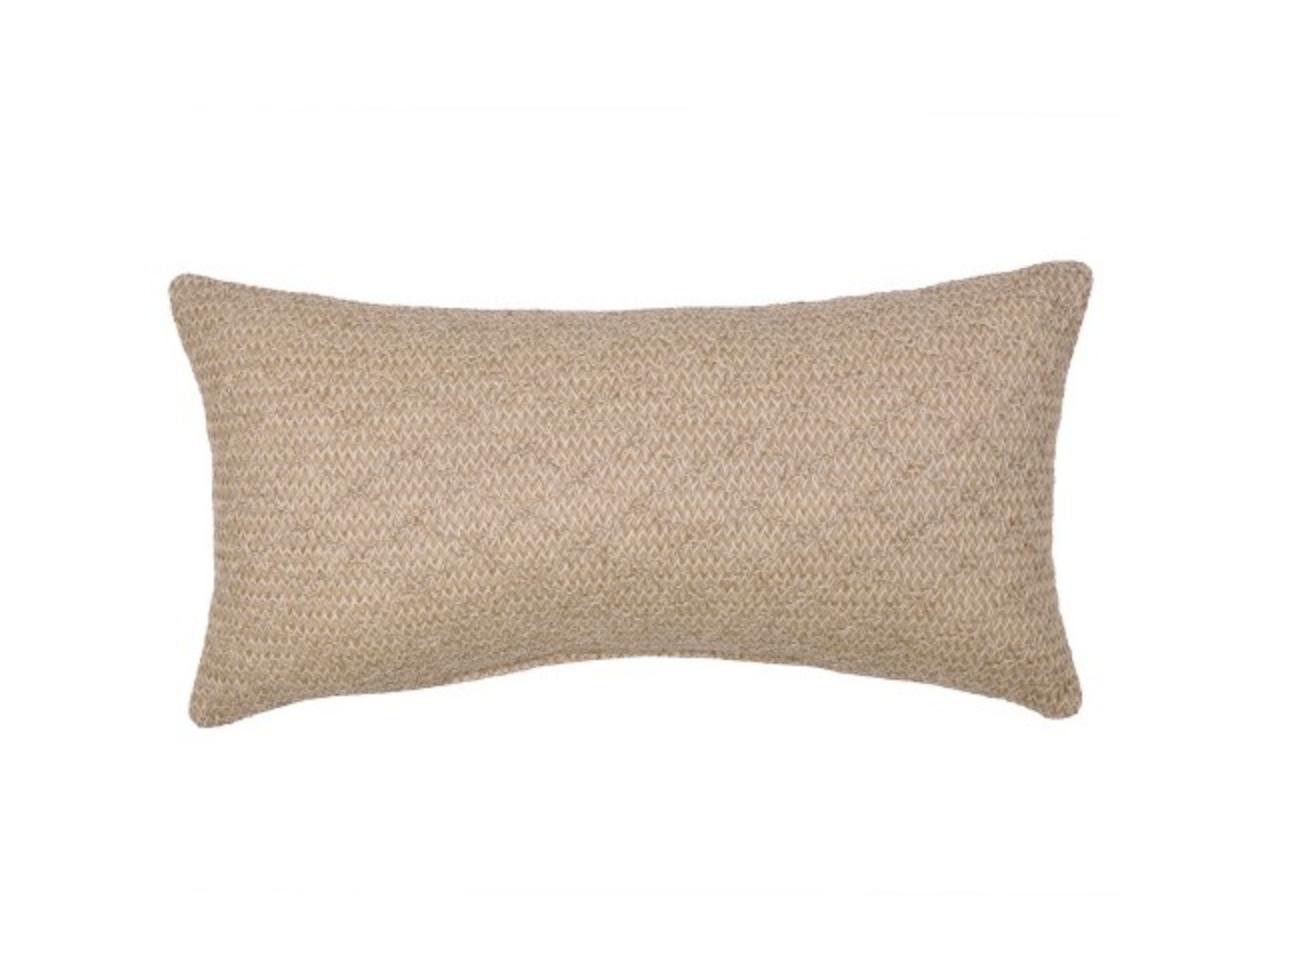 Target Outdoor Pillow Woven Natural